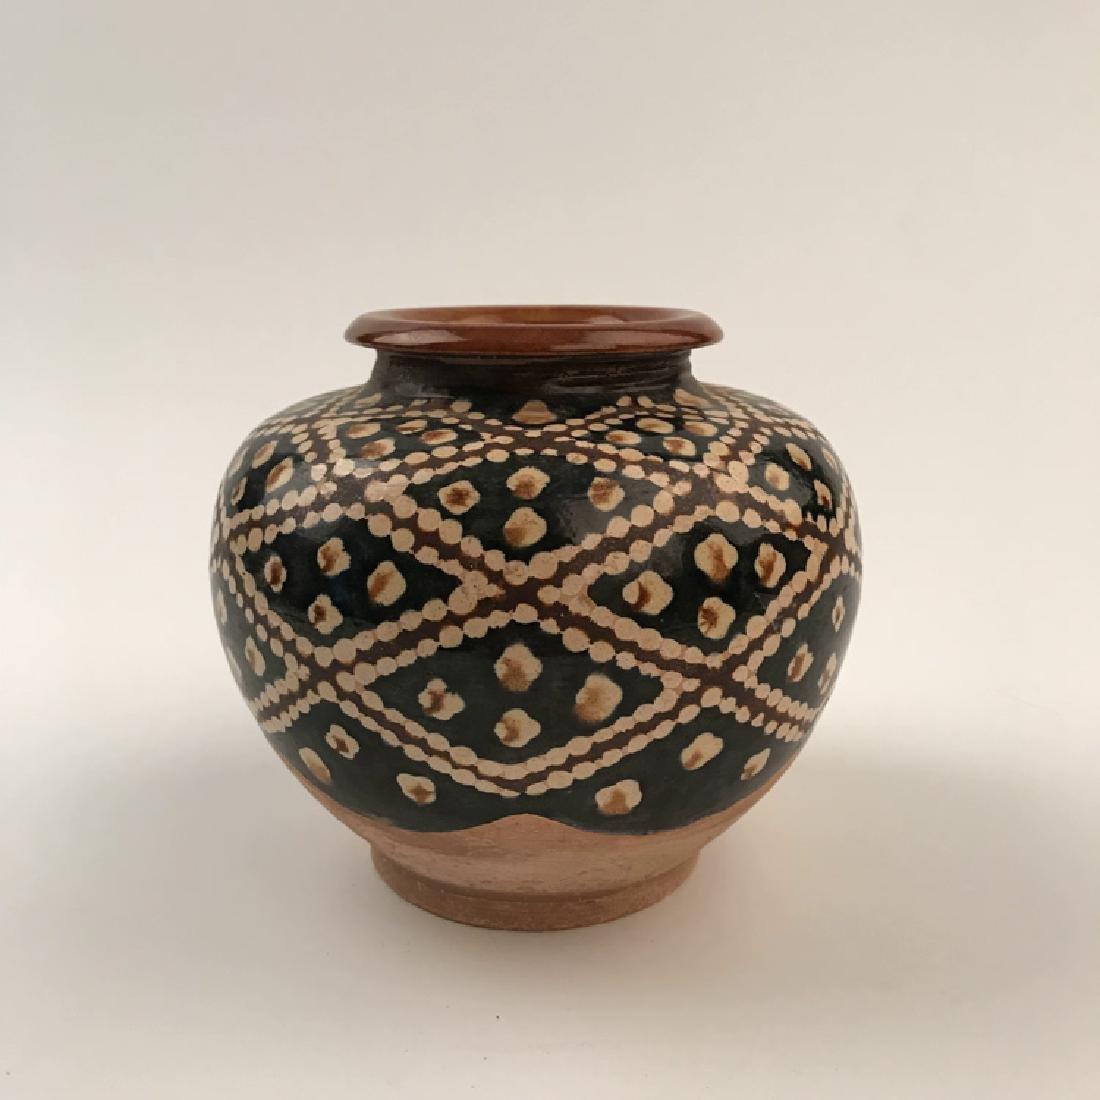 Chinese Sancai Pottery Jar - 4